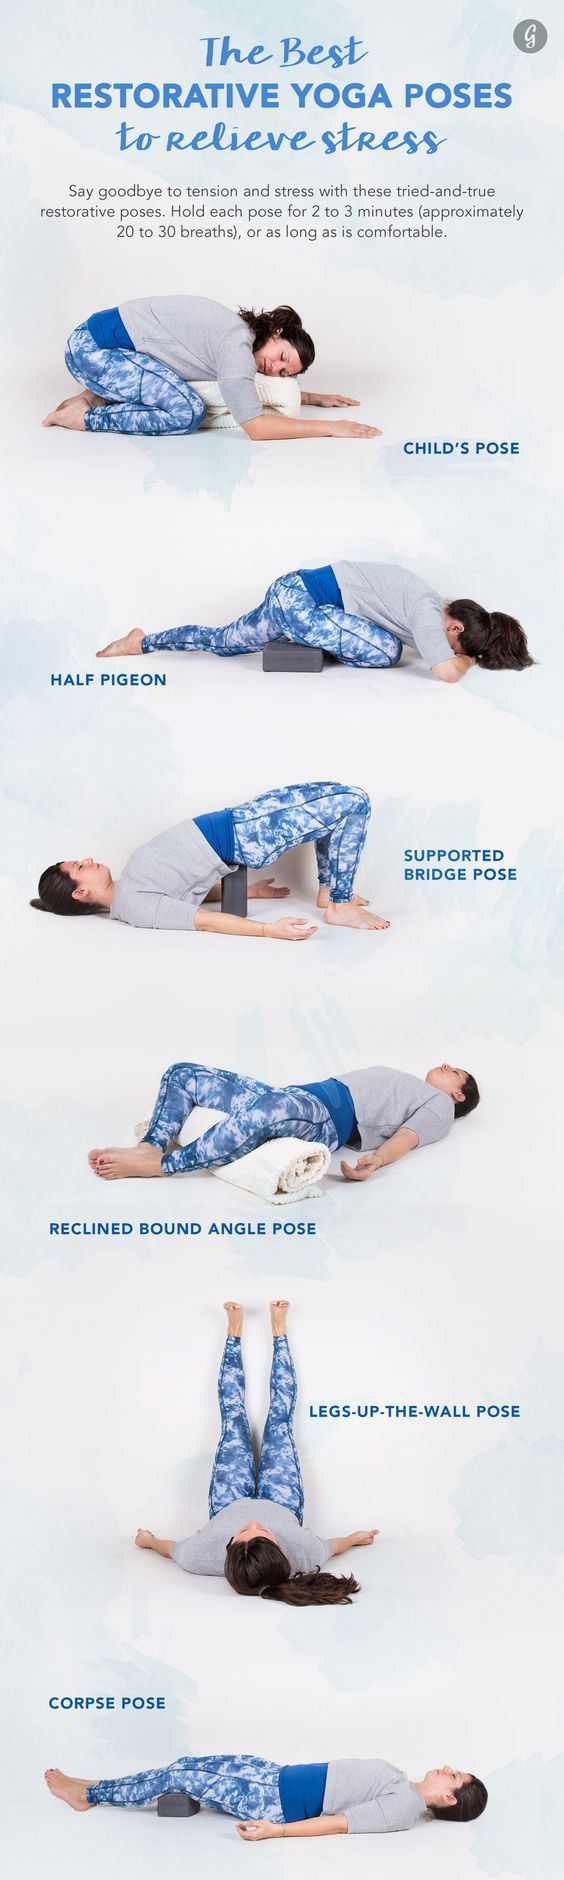 The Best Restorative Yoga Poses #restorative #yoga #greatist